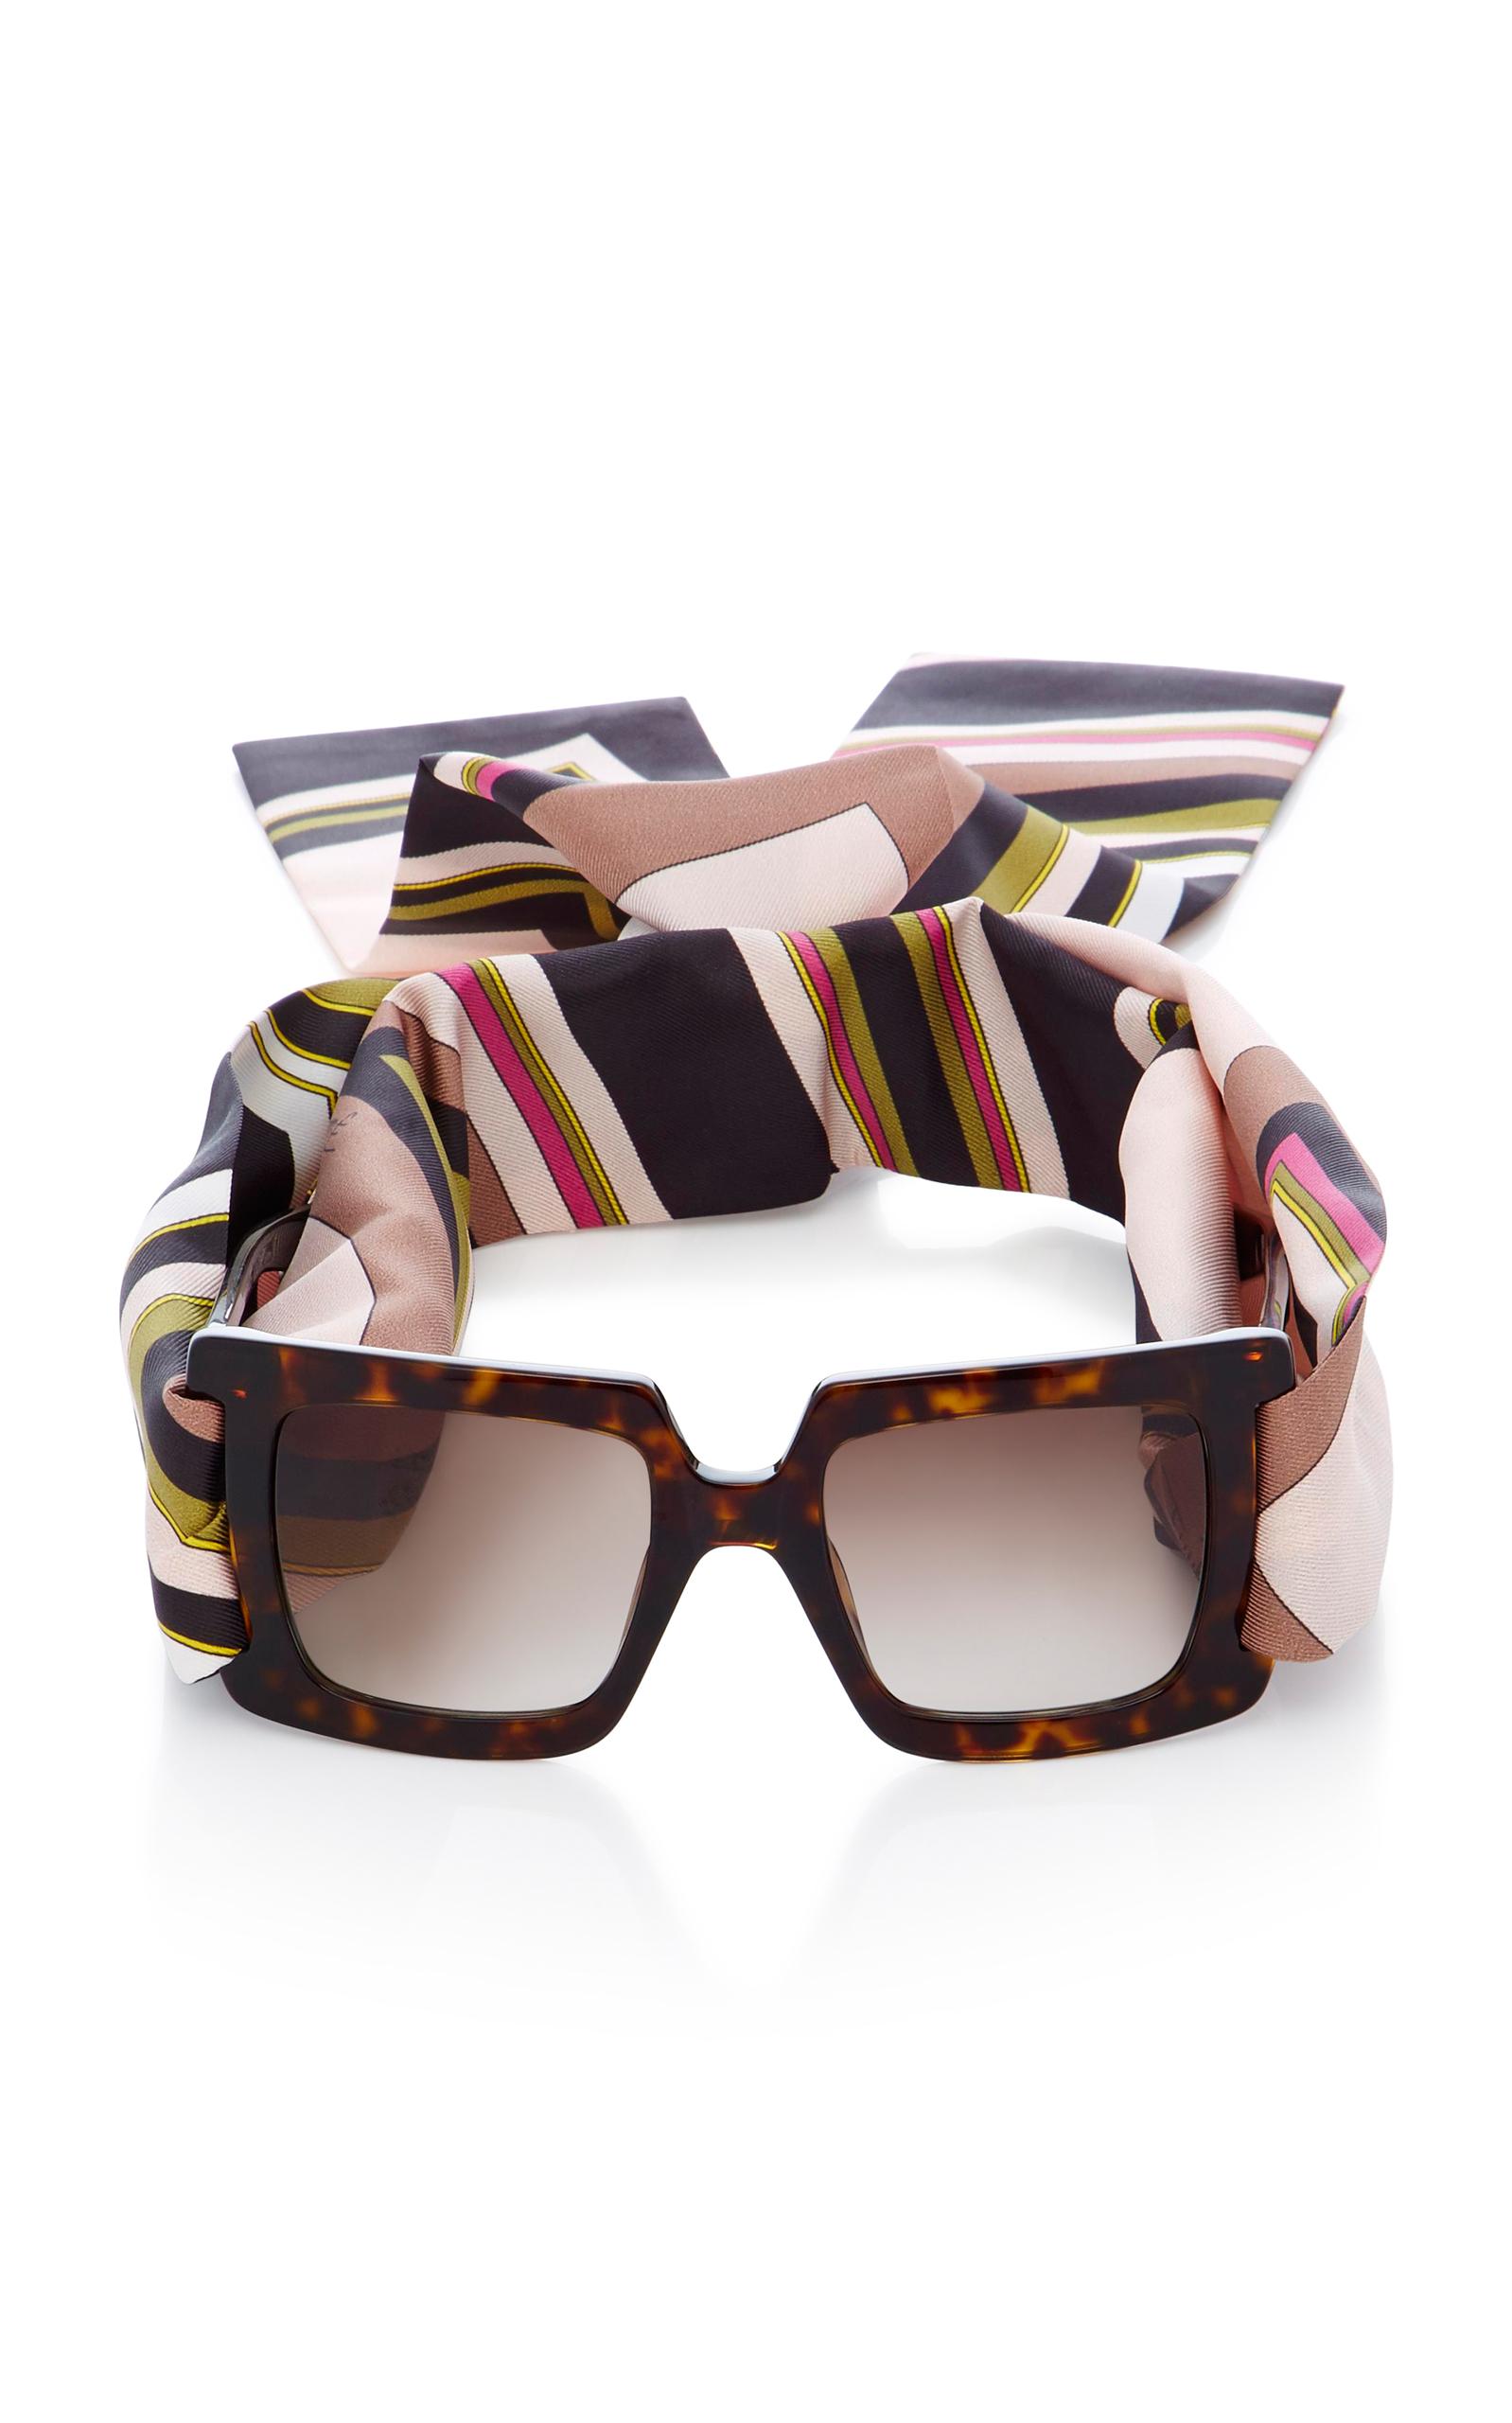 f00f92b0aef Tortoiseshell Square Frame Sunglasses by Emilio Pucci Sunglasses ...